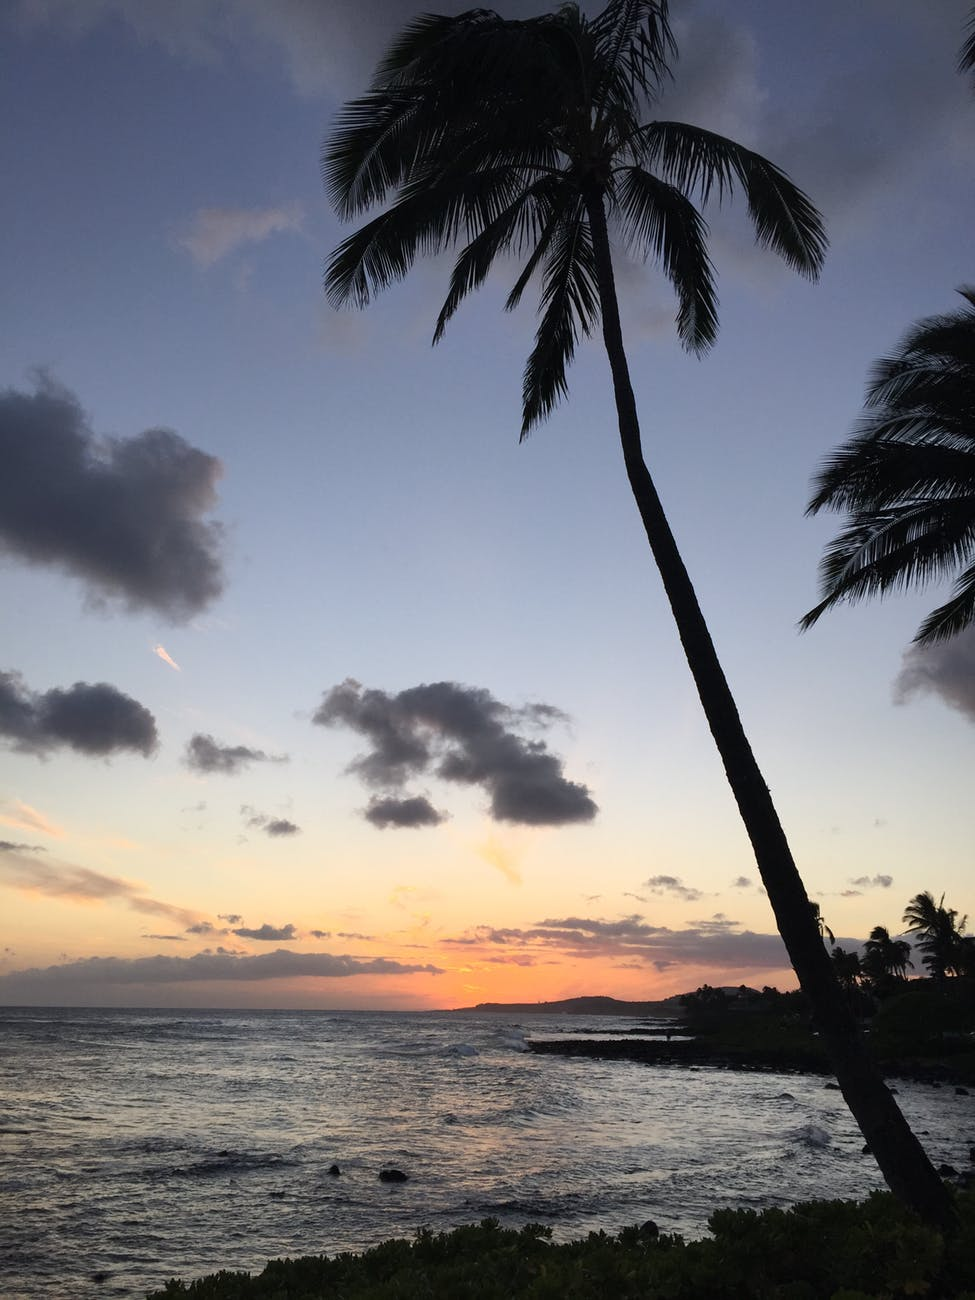 sunset beach palm trees hawaii